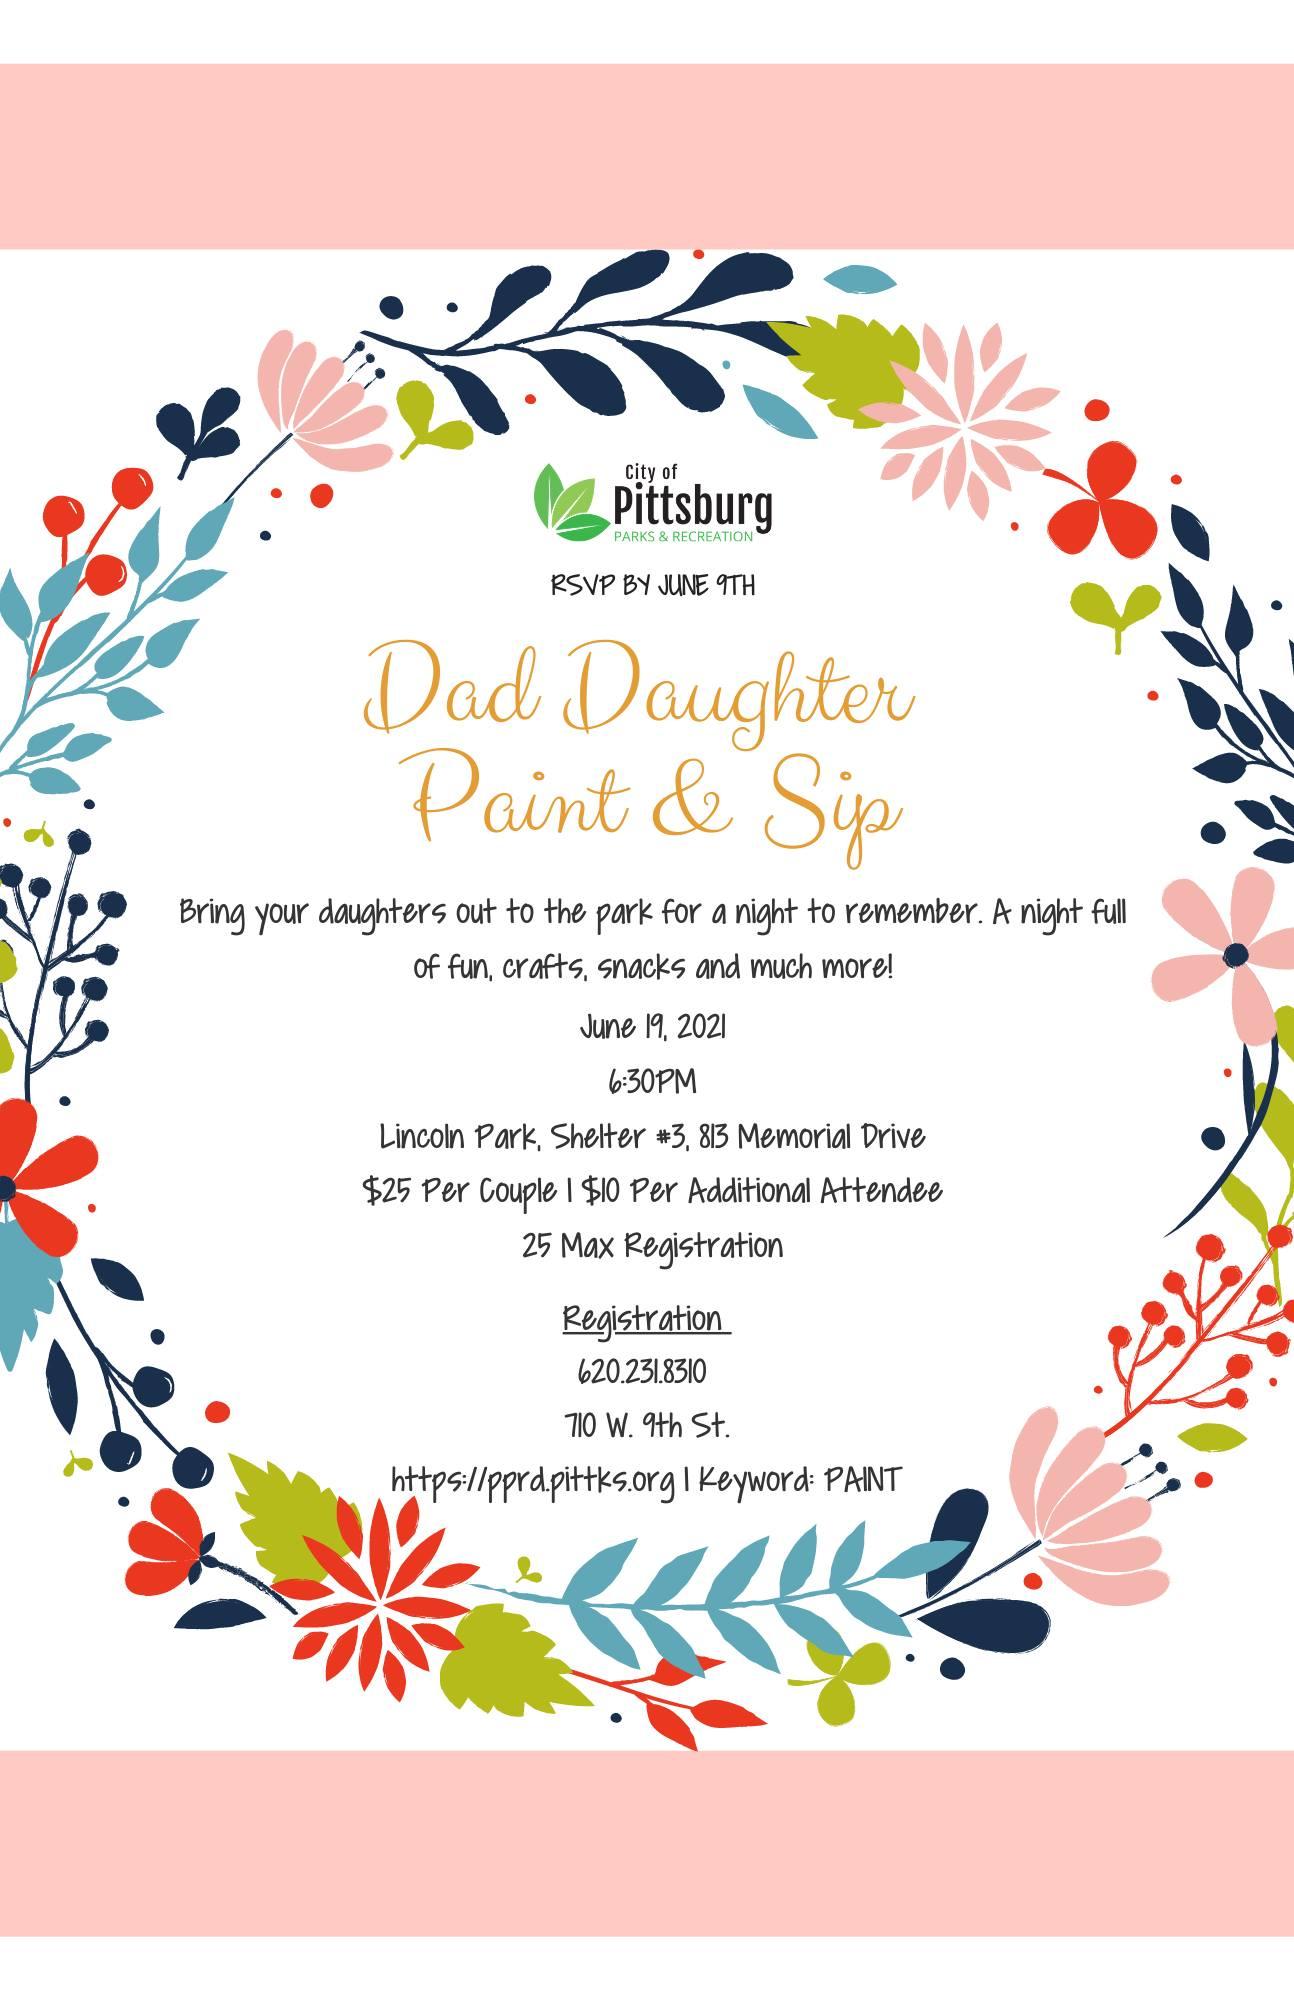 Dad Daughter Paint & Sip